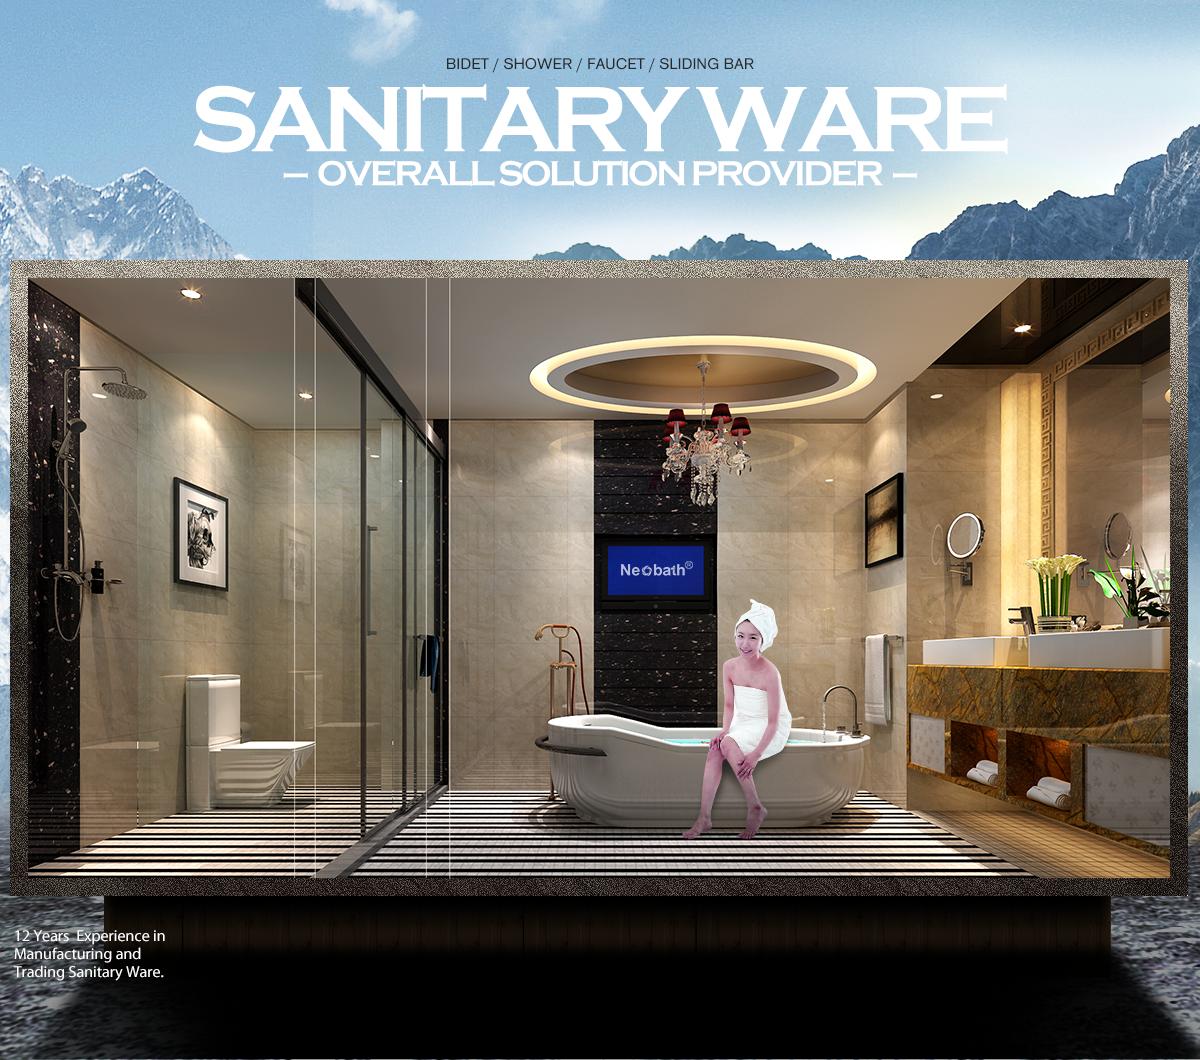 Xiamen Neobath Sanitary Ware Co Ltd Bidet Faucet